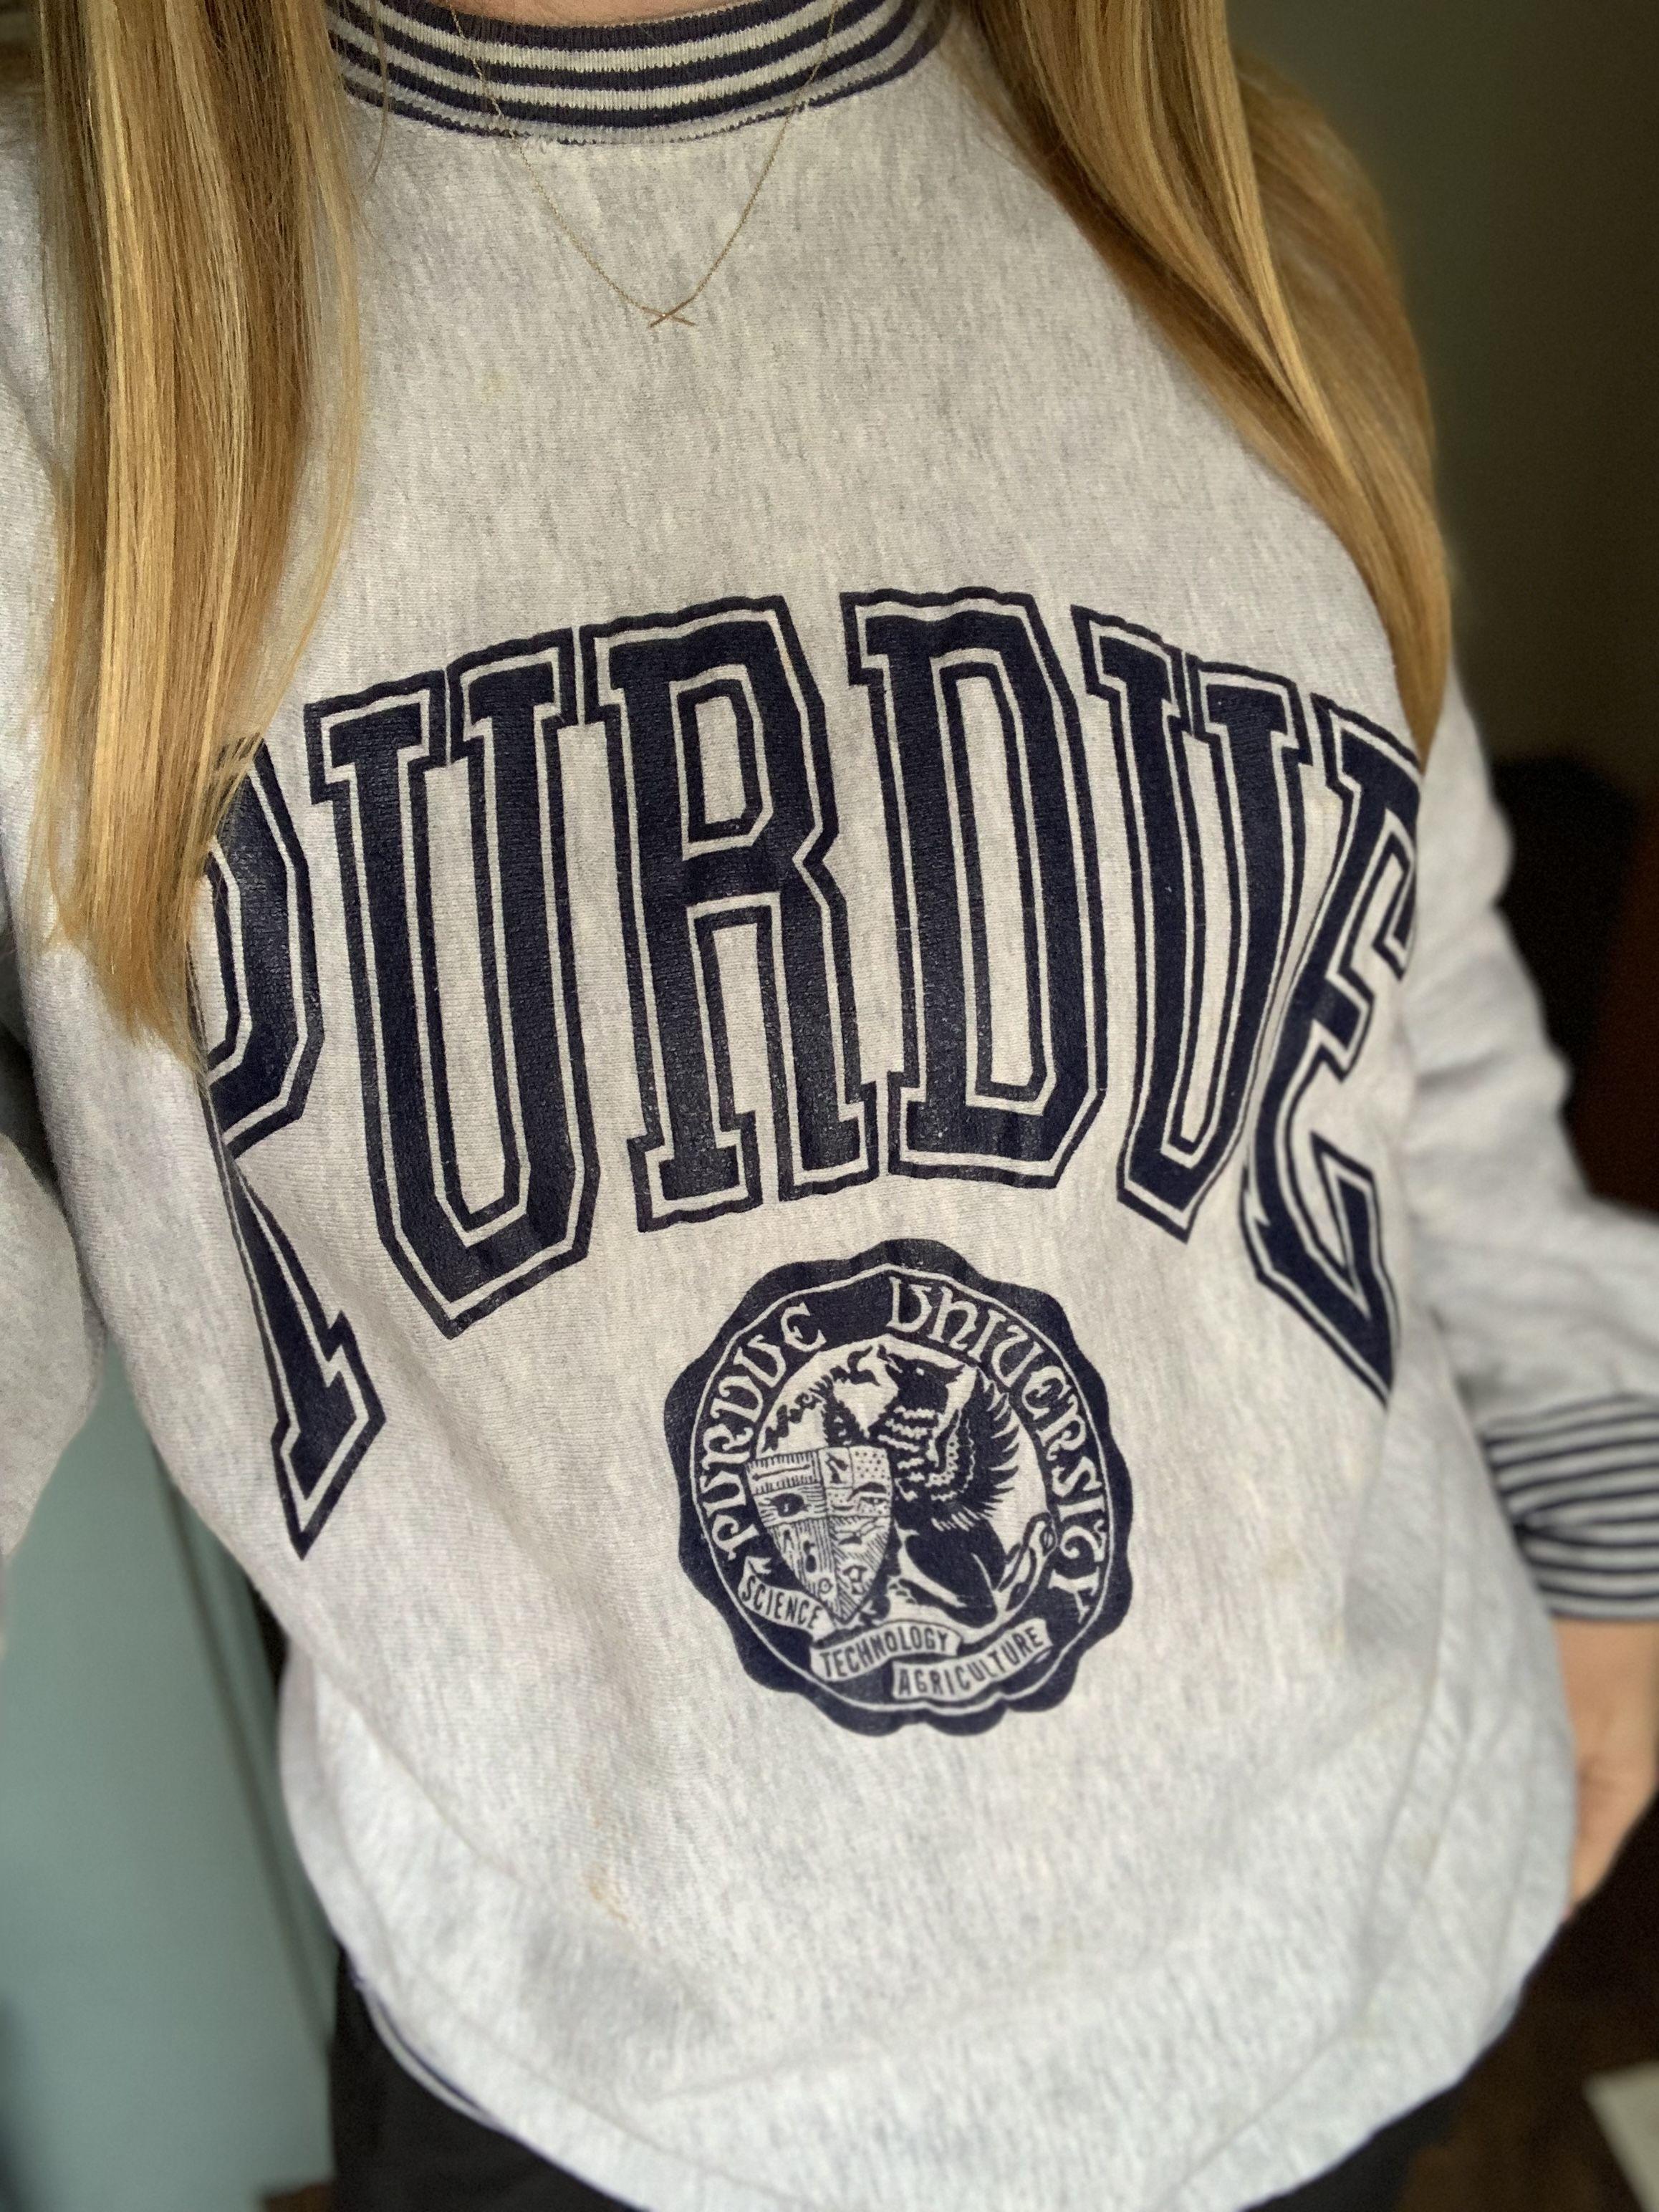 Vintage 80s Purdue University Sweatshirt Vintage Clothing Men Vintage Outfits Sweatshirts [ 3088 x 2316 Pixel ]